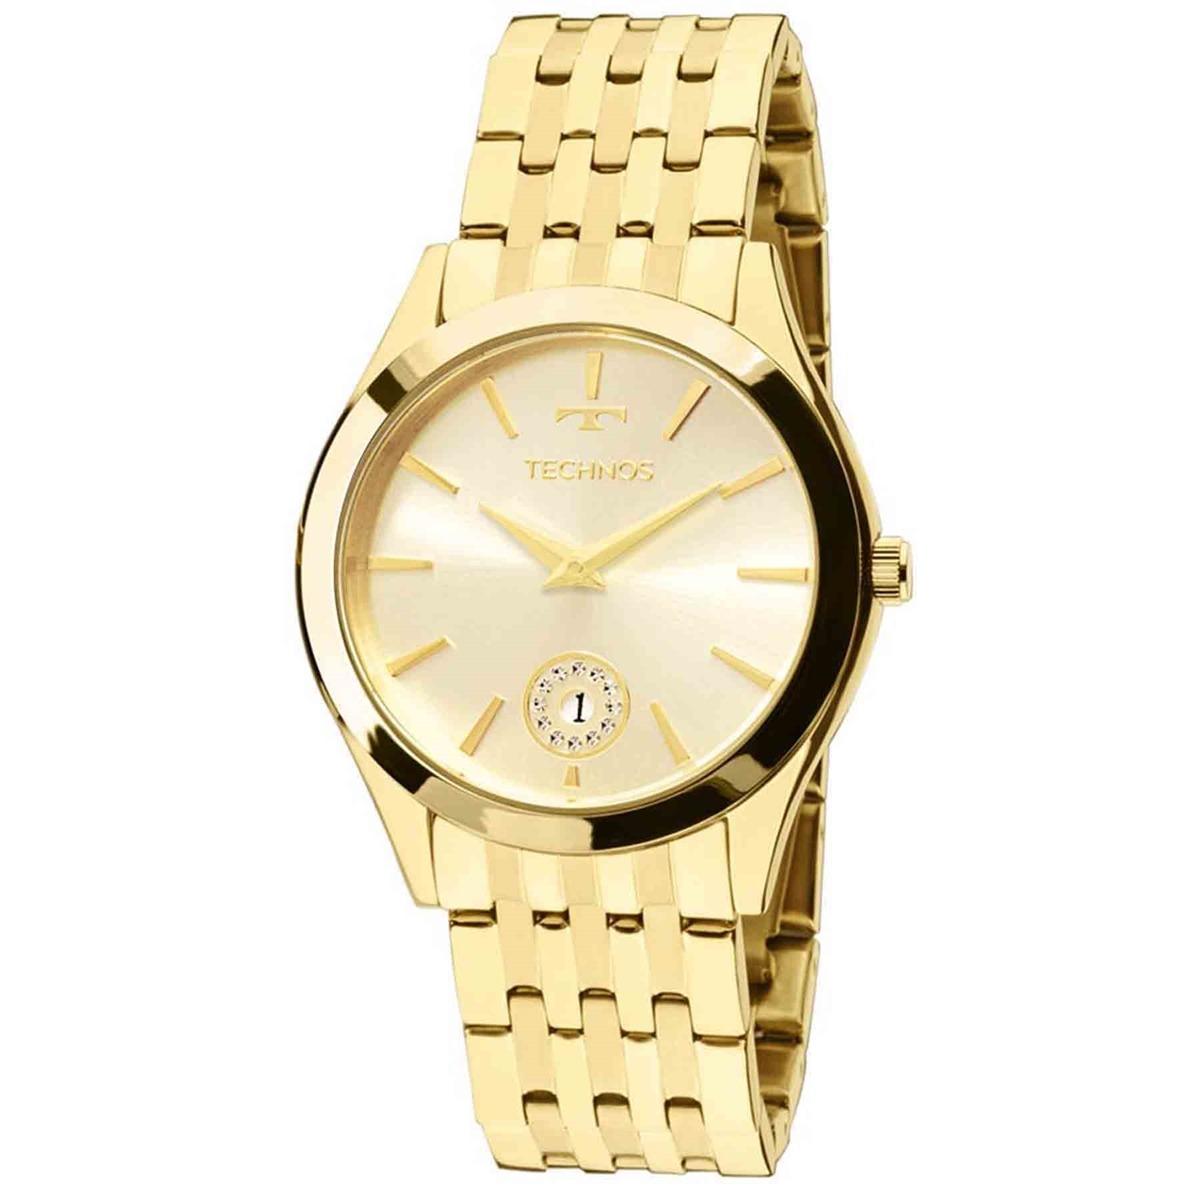 Relógio Technos Eleance Ladies Feminino Analógico 1m15aq 4x - R  443 ... f3ab4cc9a9